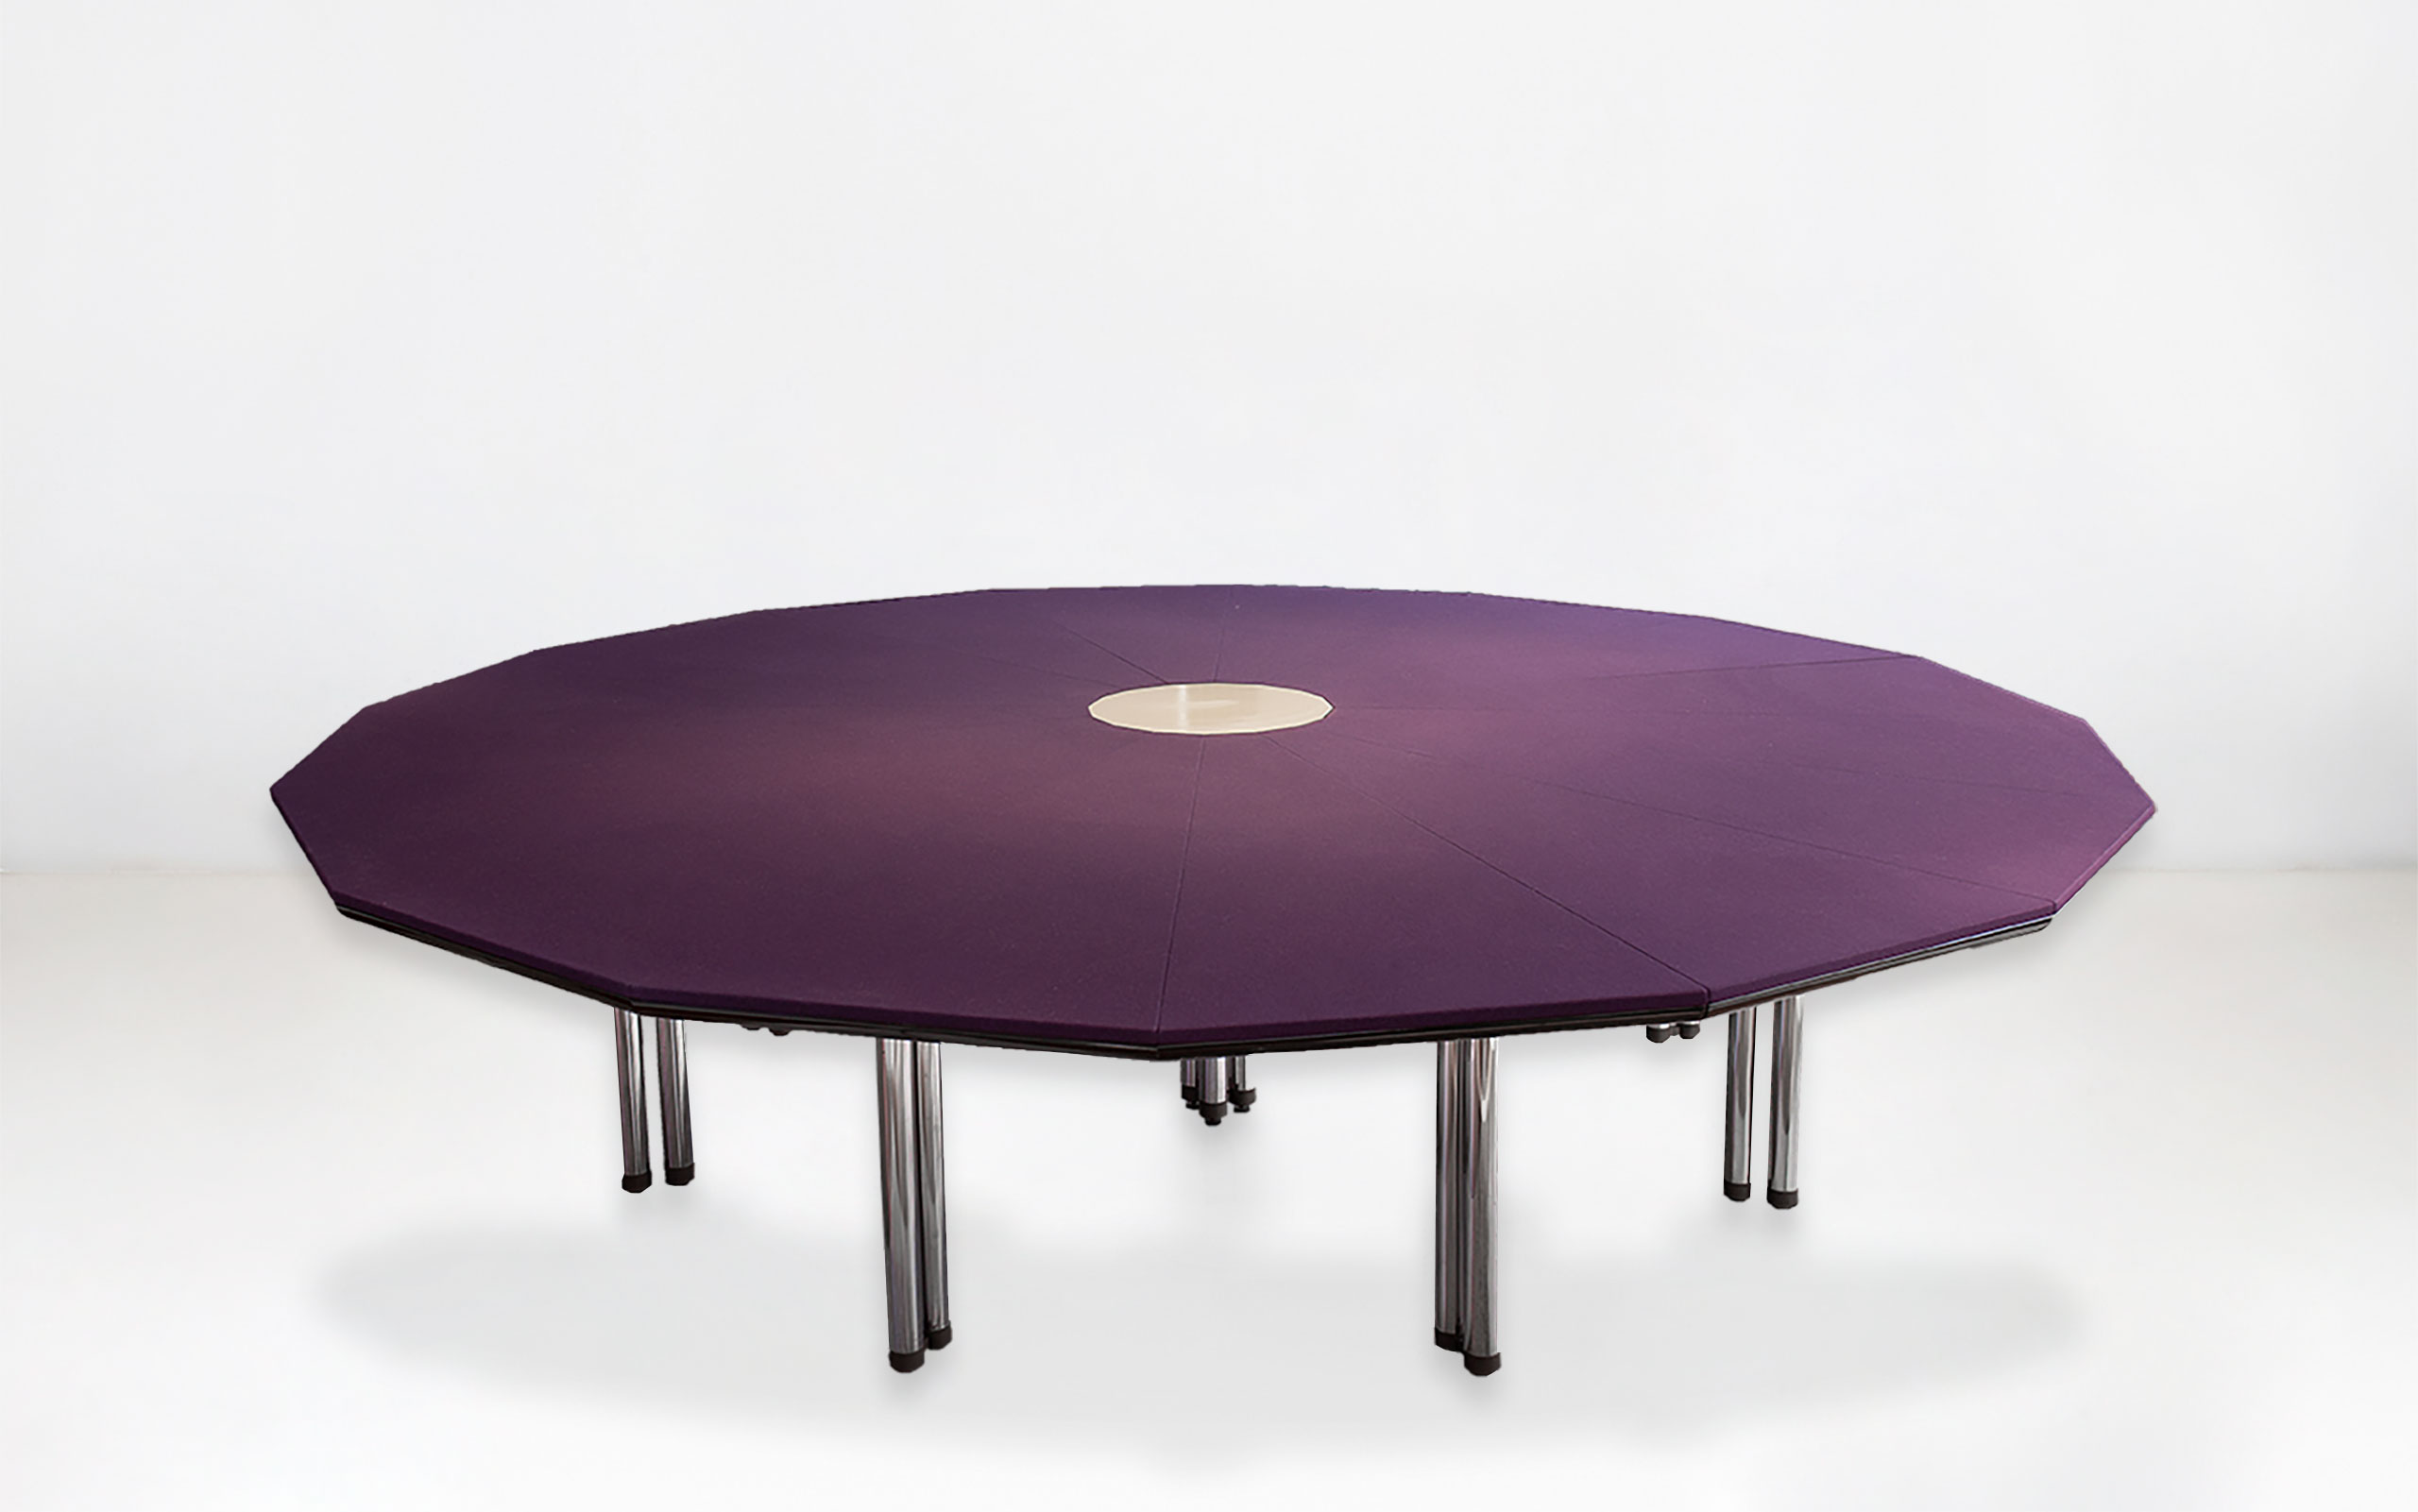 Bisanzio table by Hiroyuki Toyoda | Paradisoterrestre